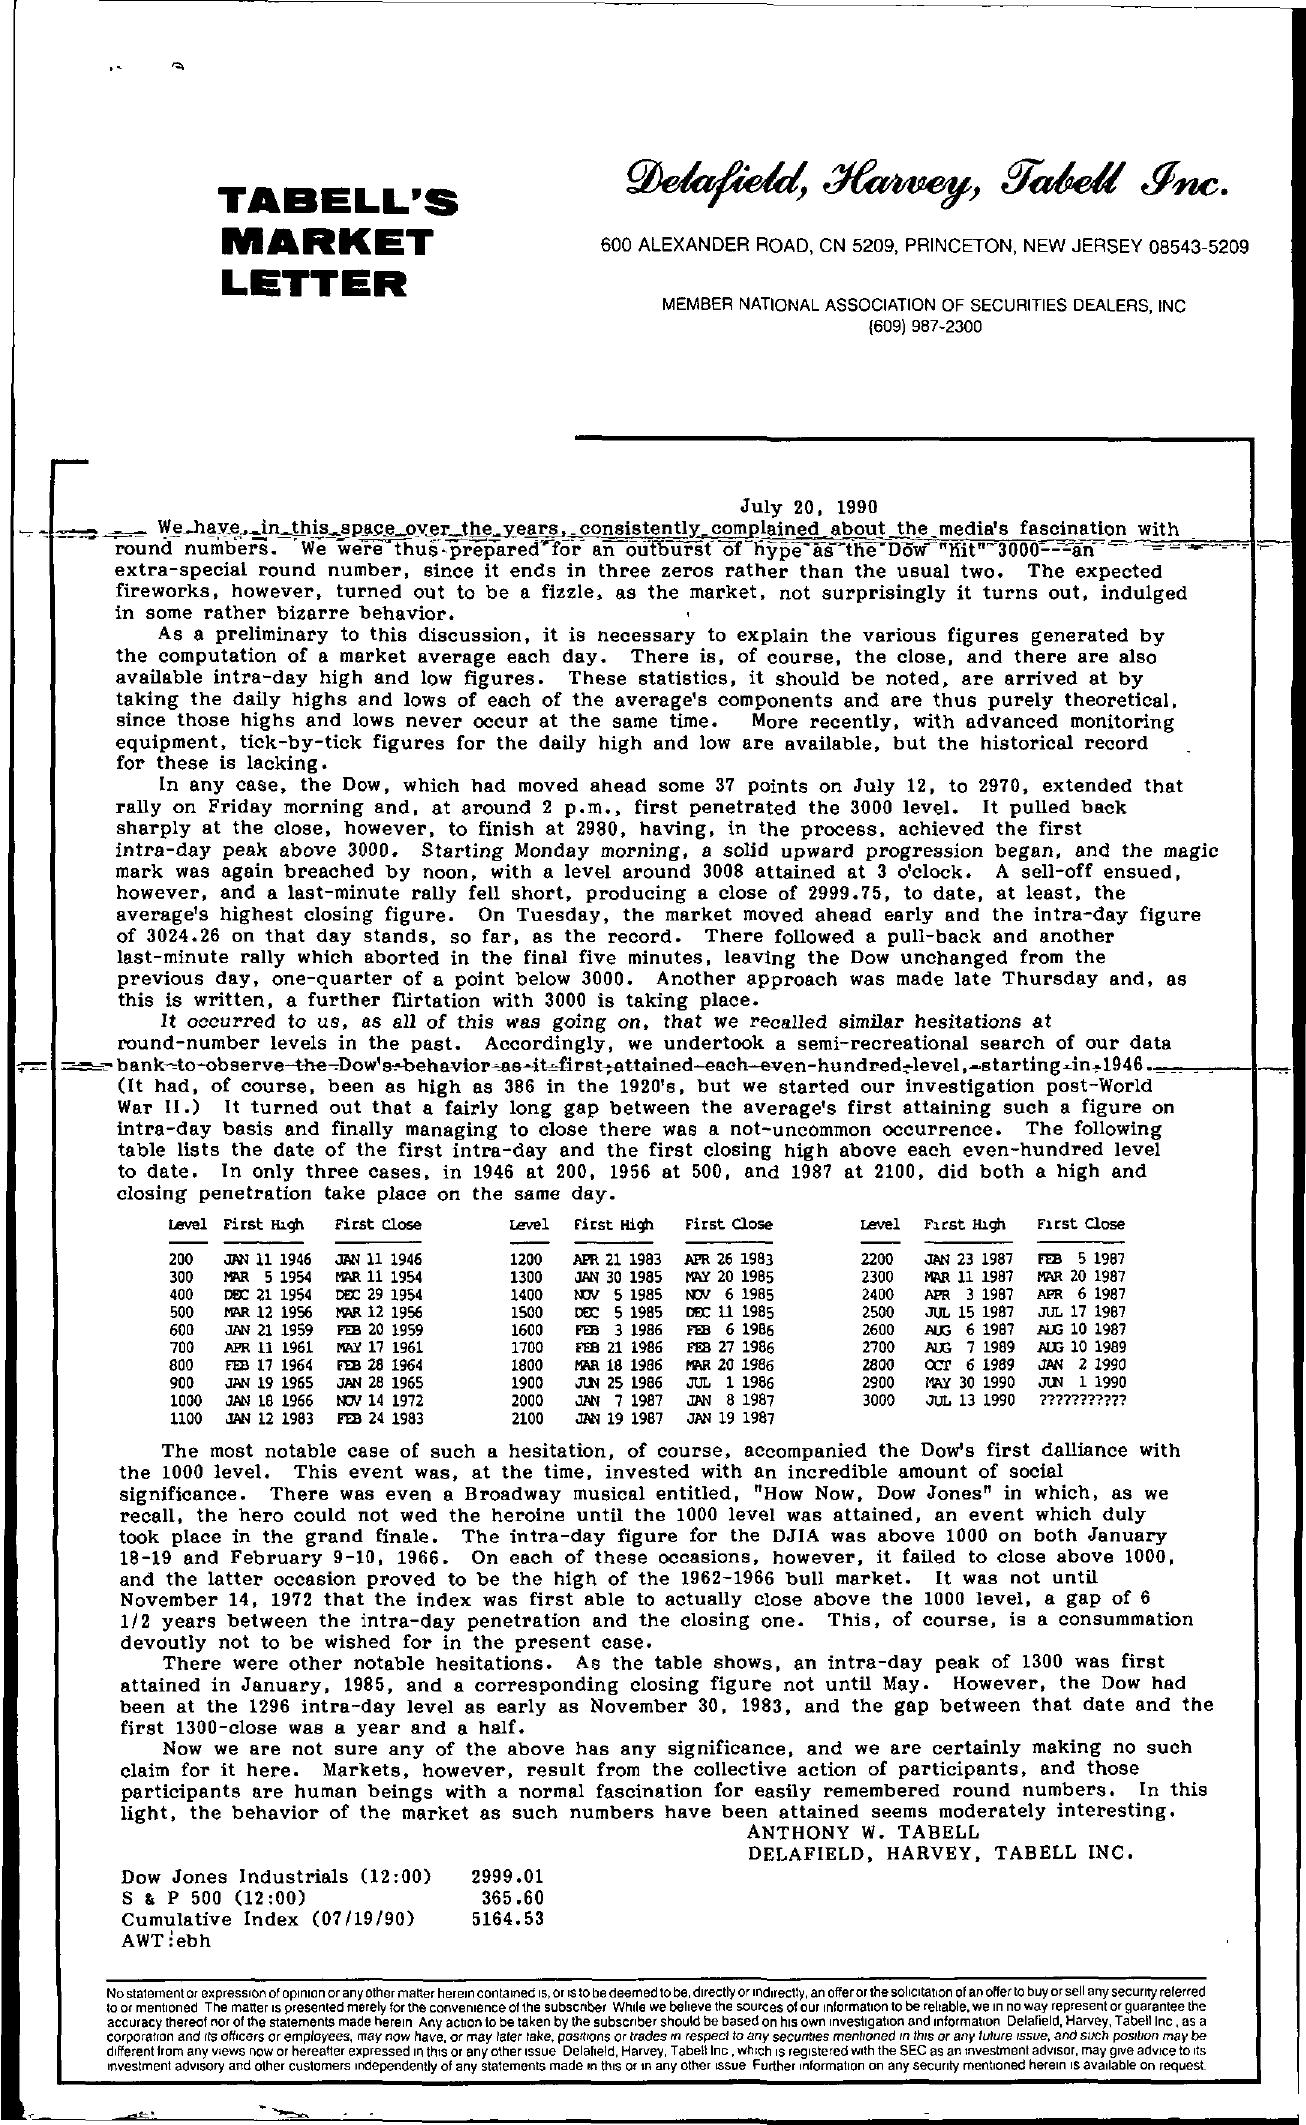 Tabell's Market Letter - July 20, 1990